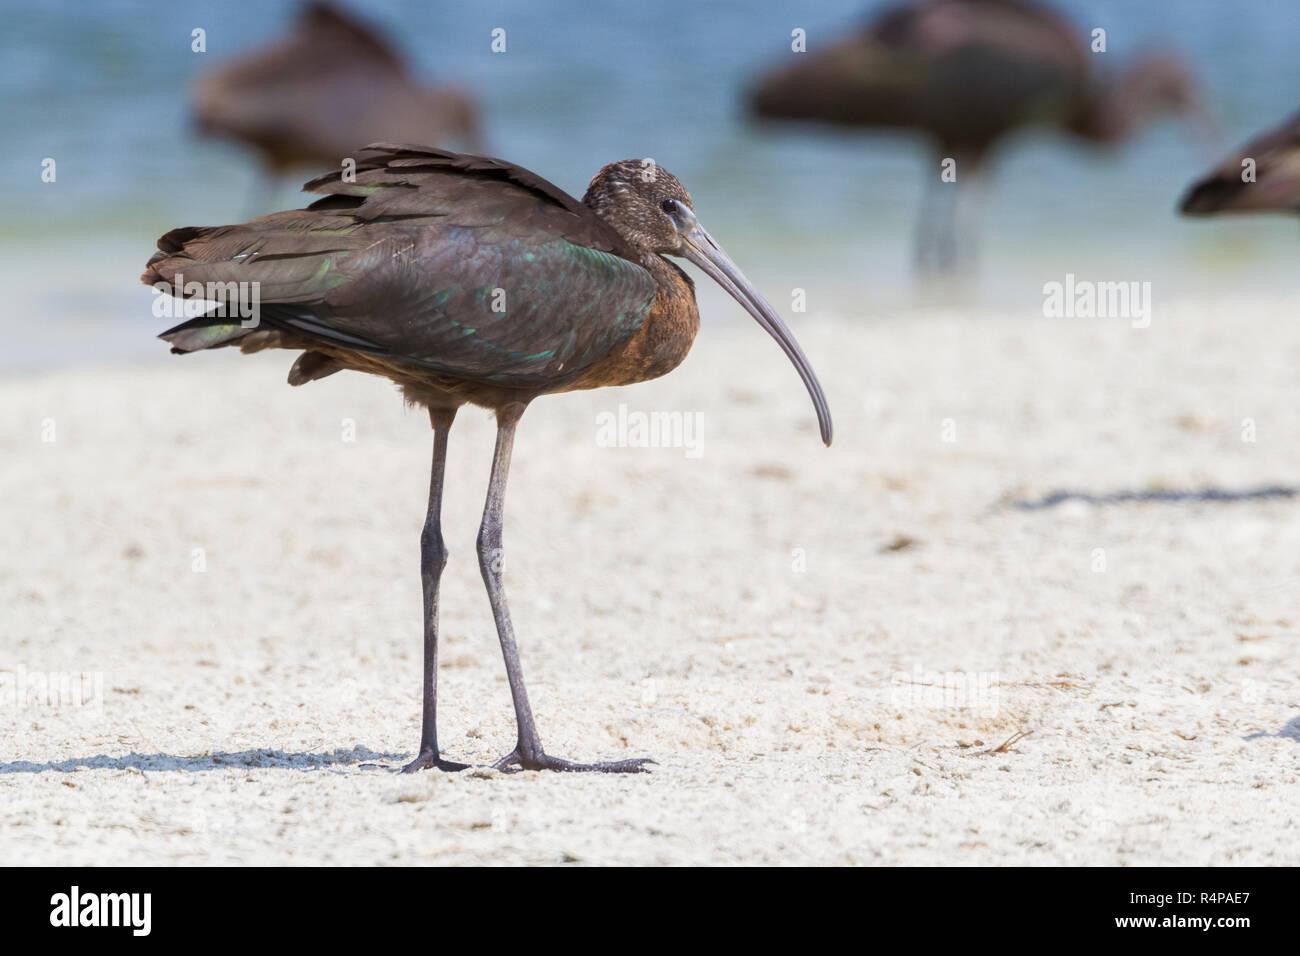 Glossy Ibis (Plegadis falcinellus), immature standing on a beach in Oman - Stock Image